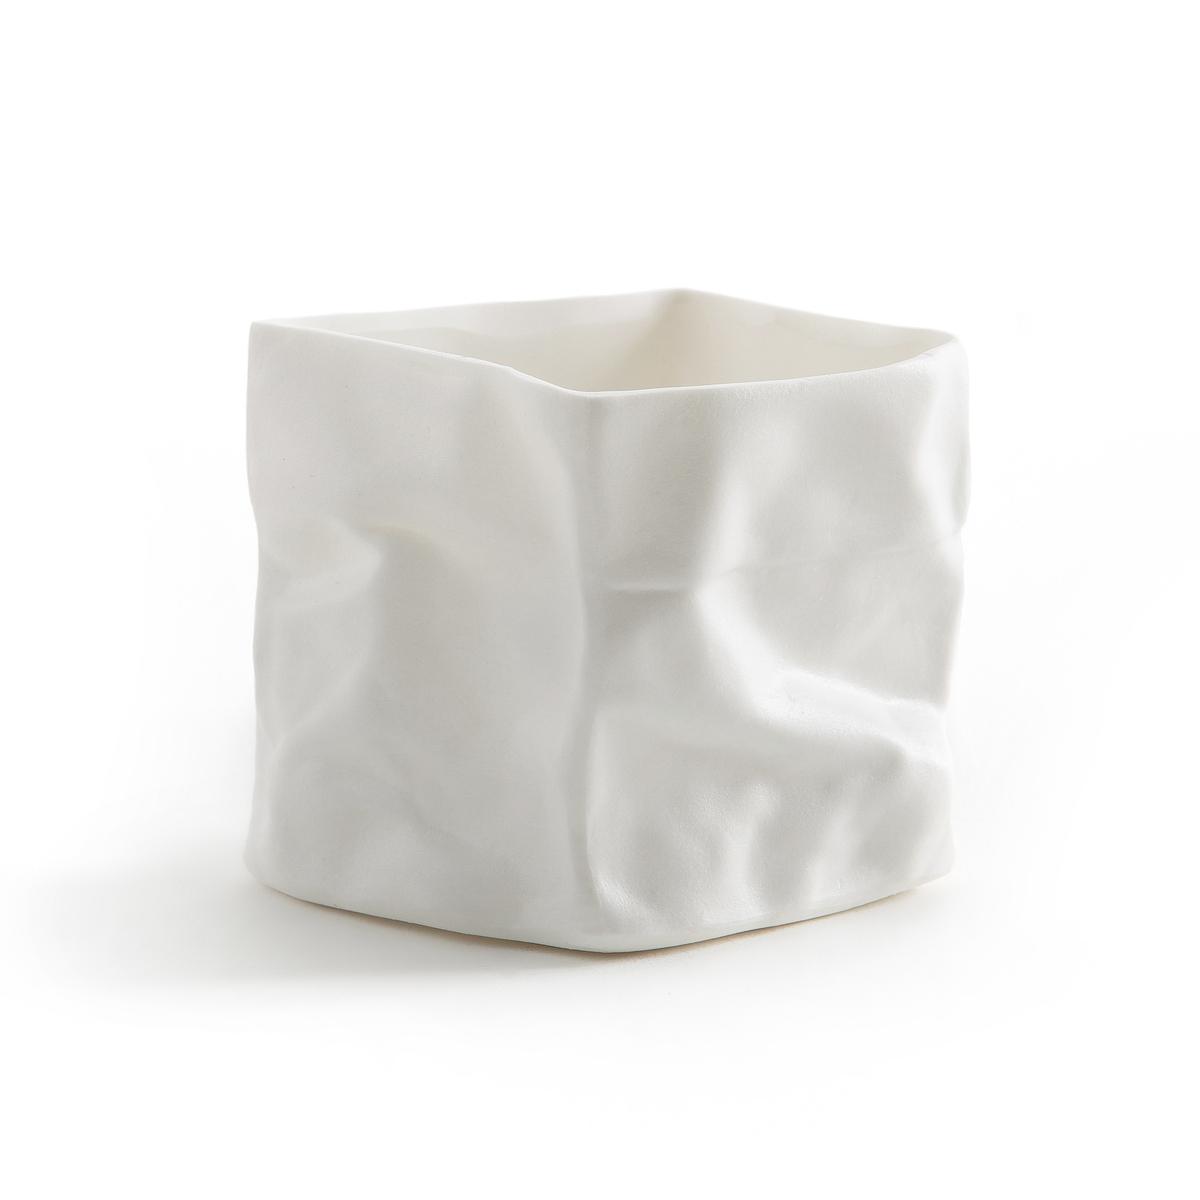 Ваза-светильник из керамики Kiki дизайн Serax